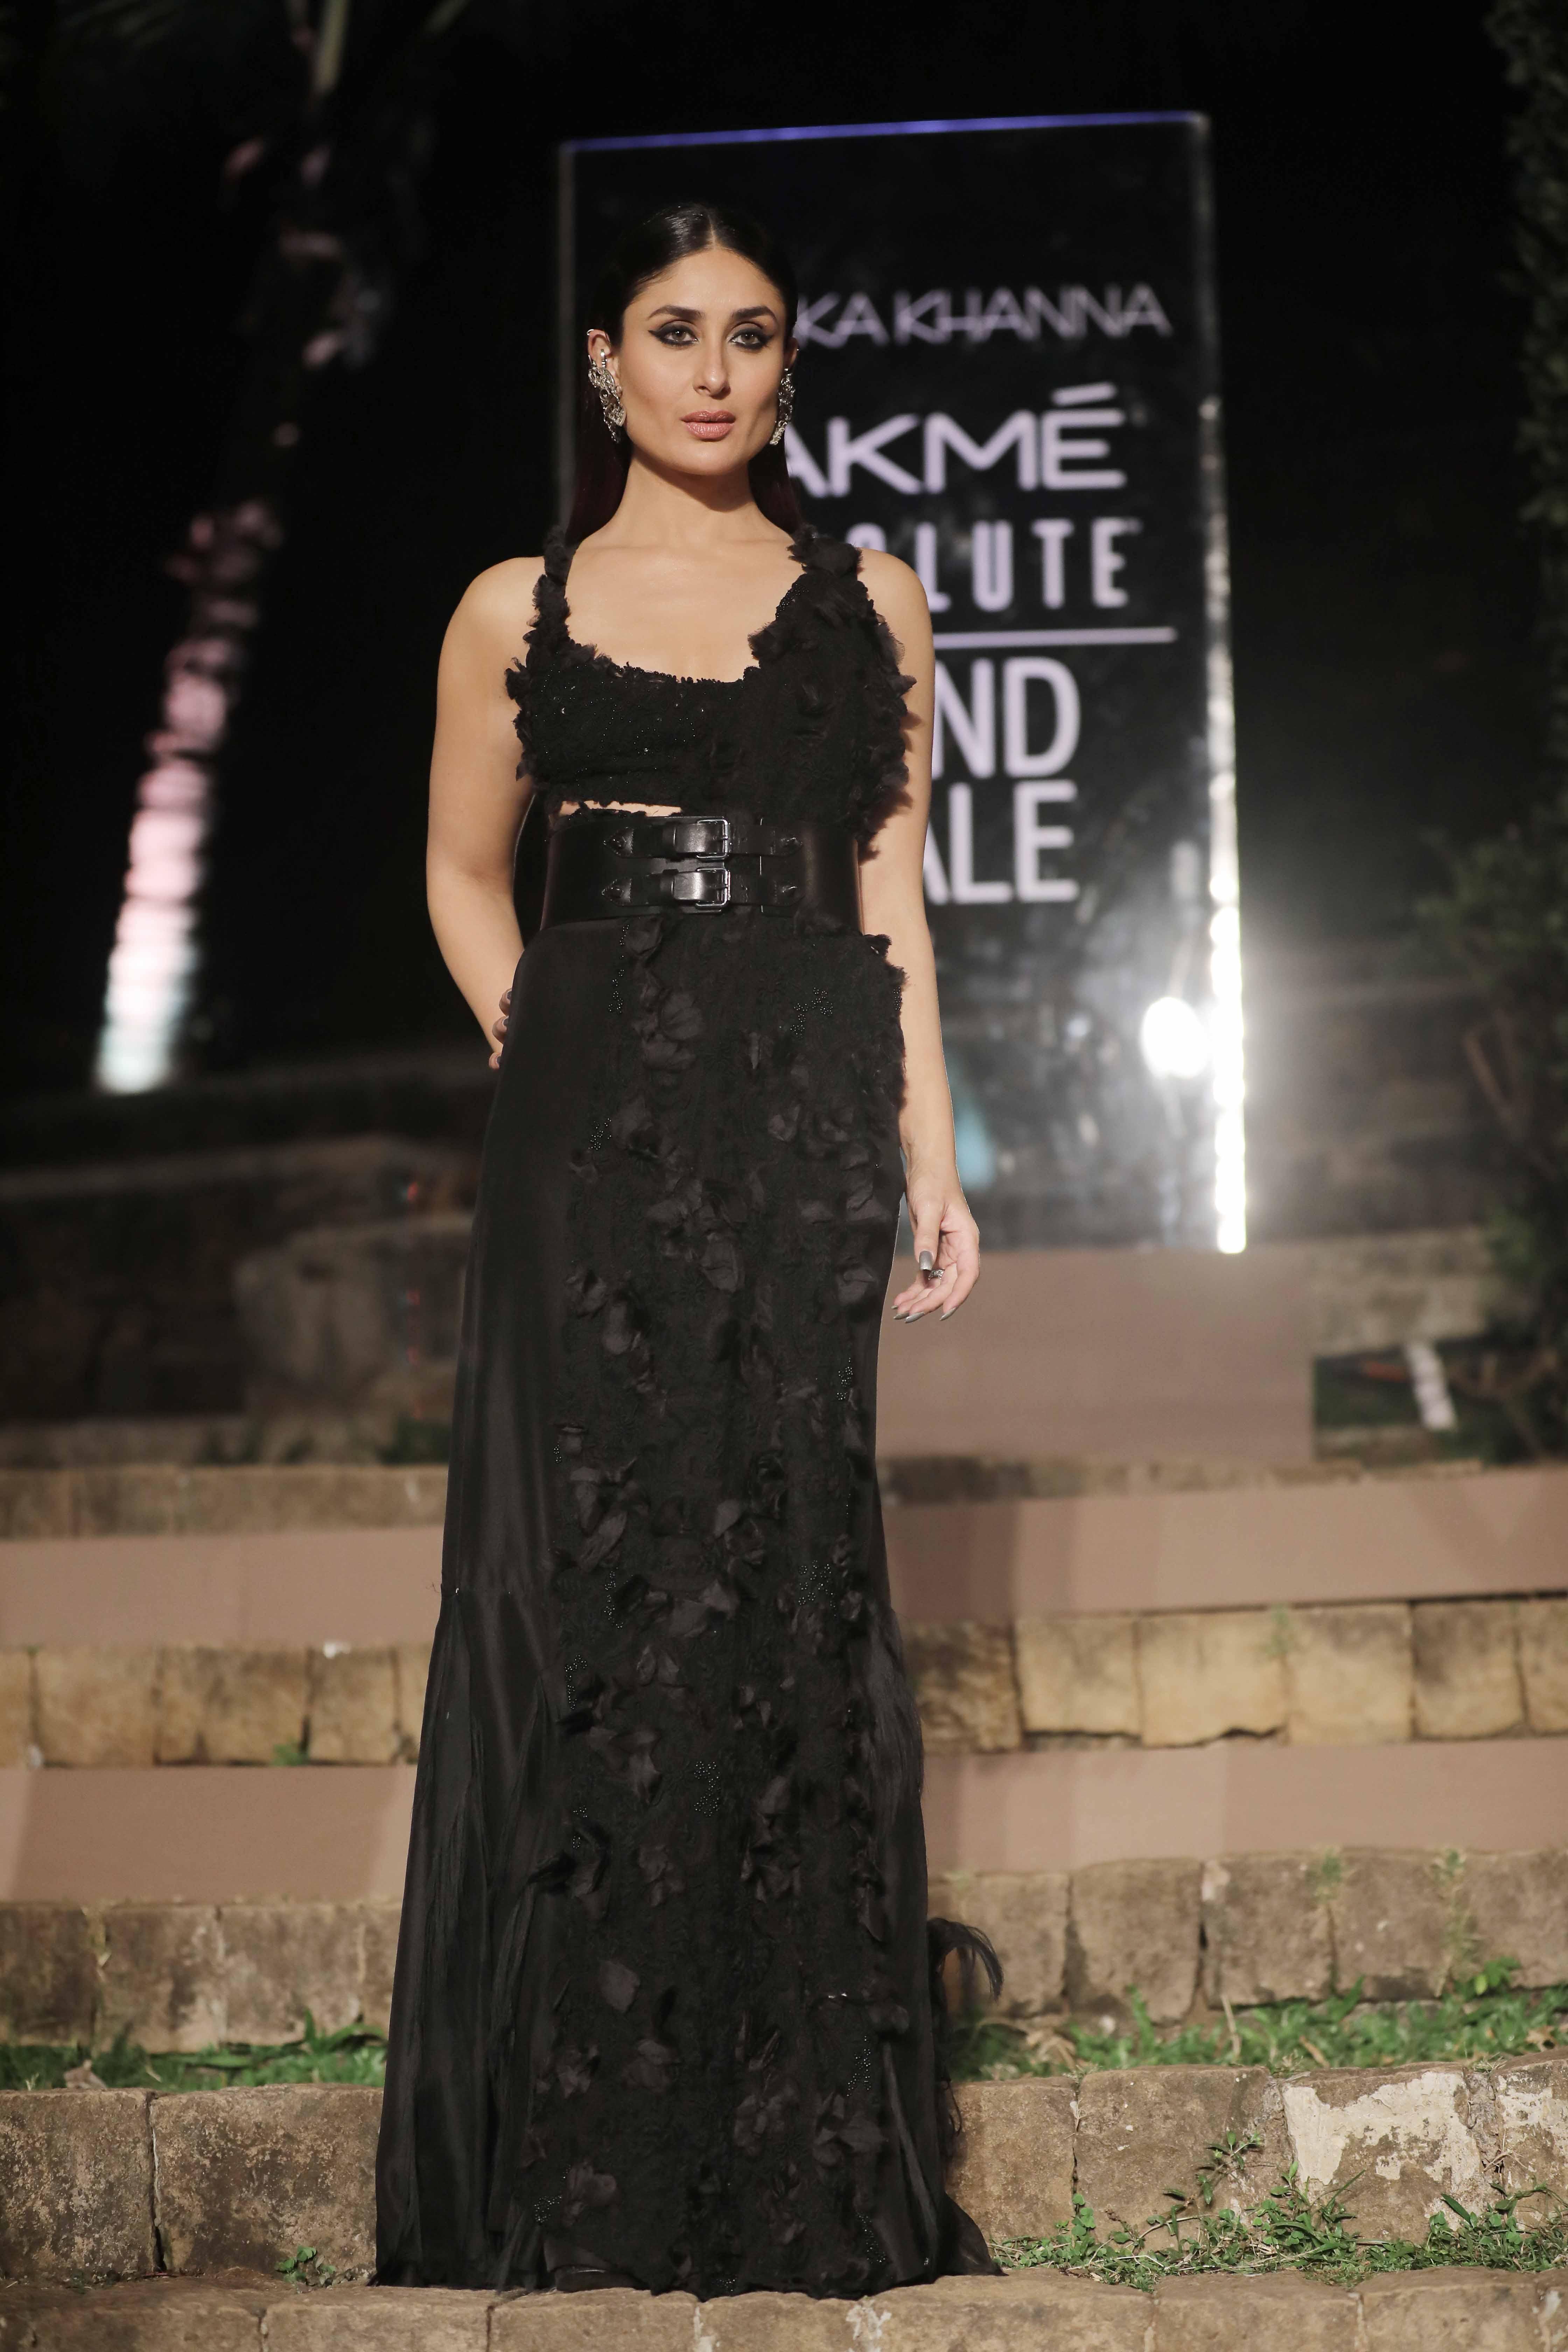 Lakme Absolute Brand Ambassador Kareena Kapoor Khan for Anamika Khanna